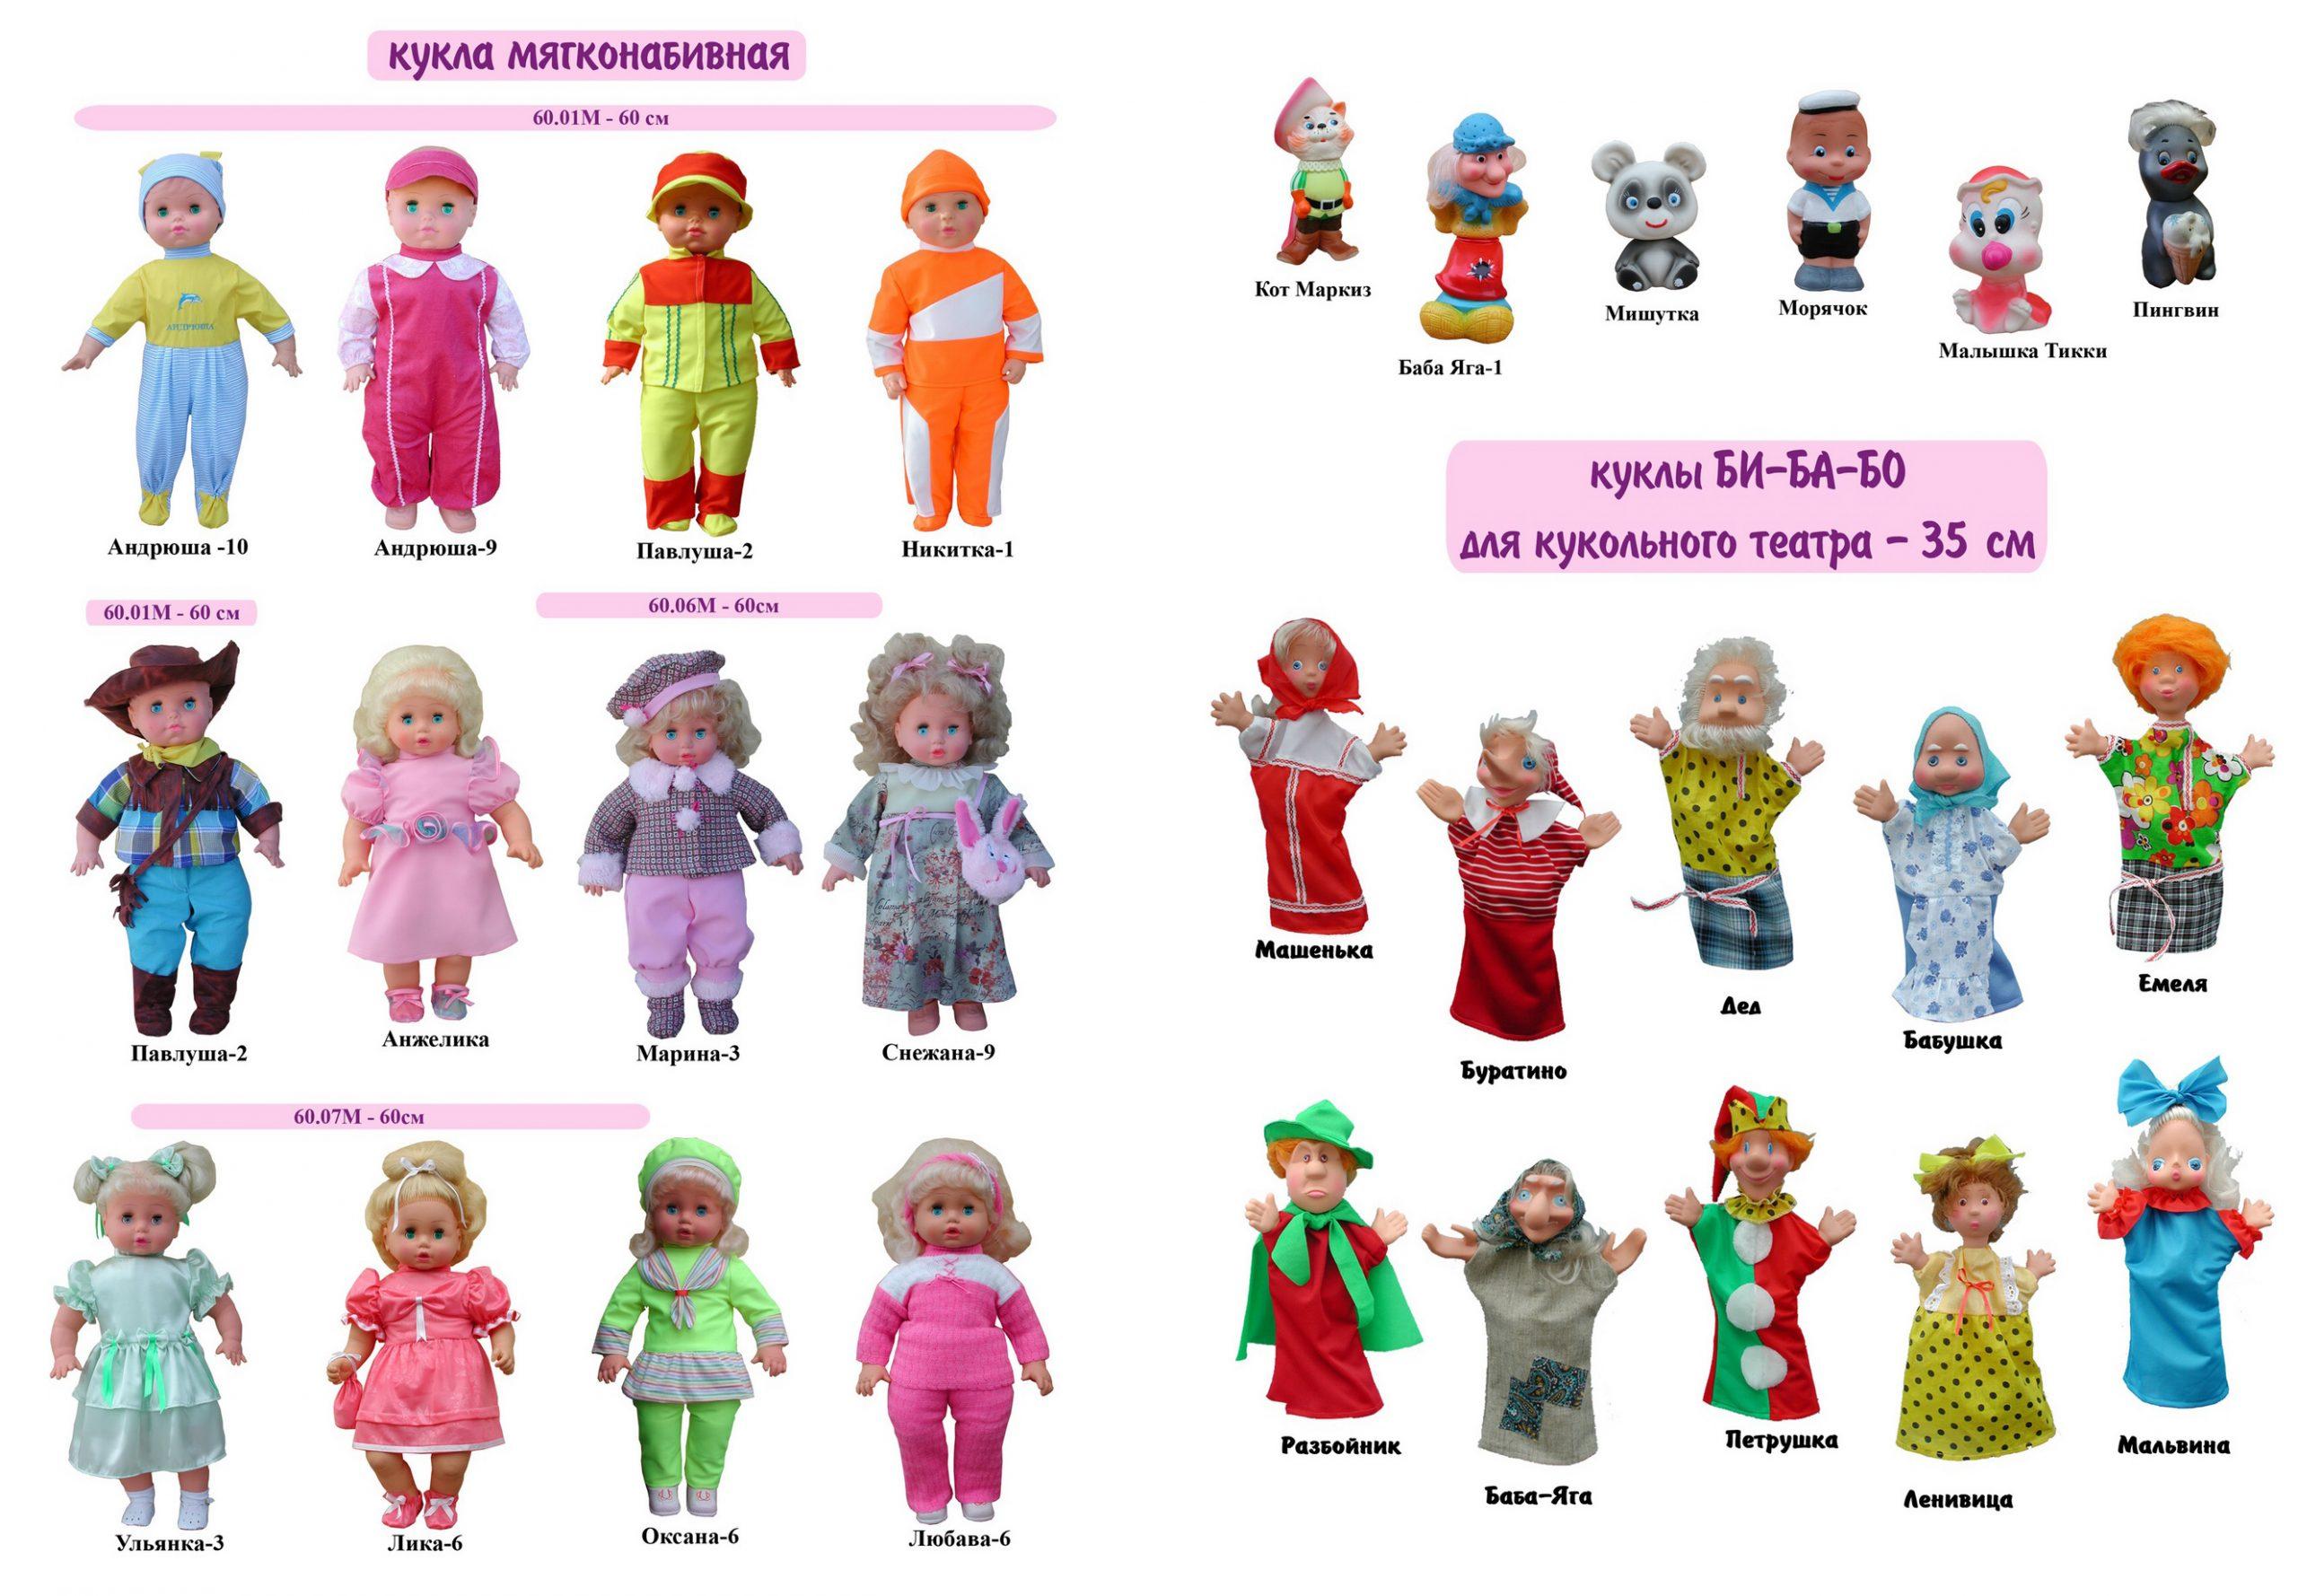 Кукла мягконабивная и Би-Ба-Бо